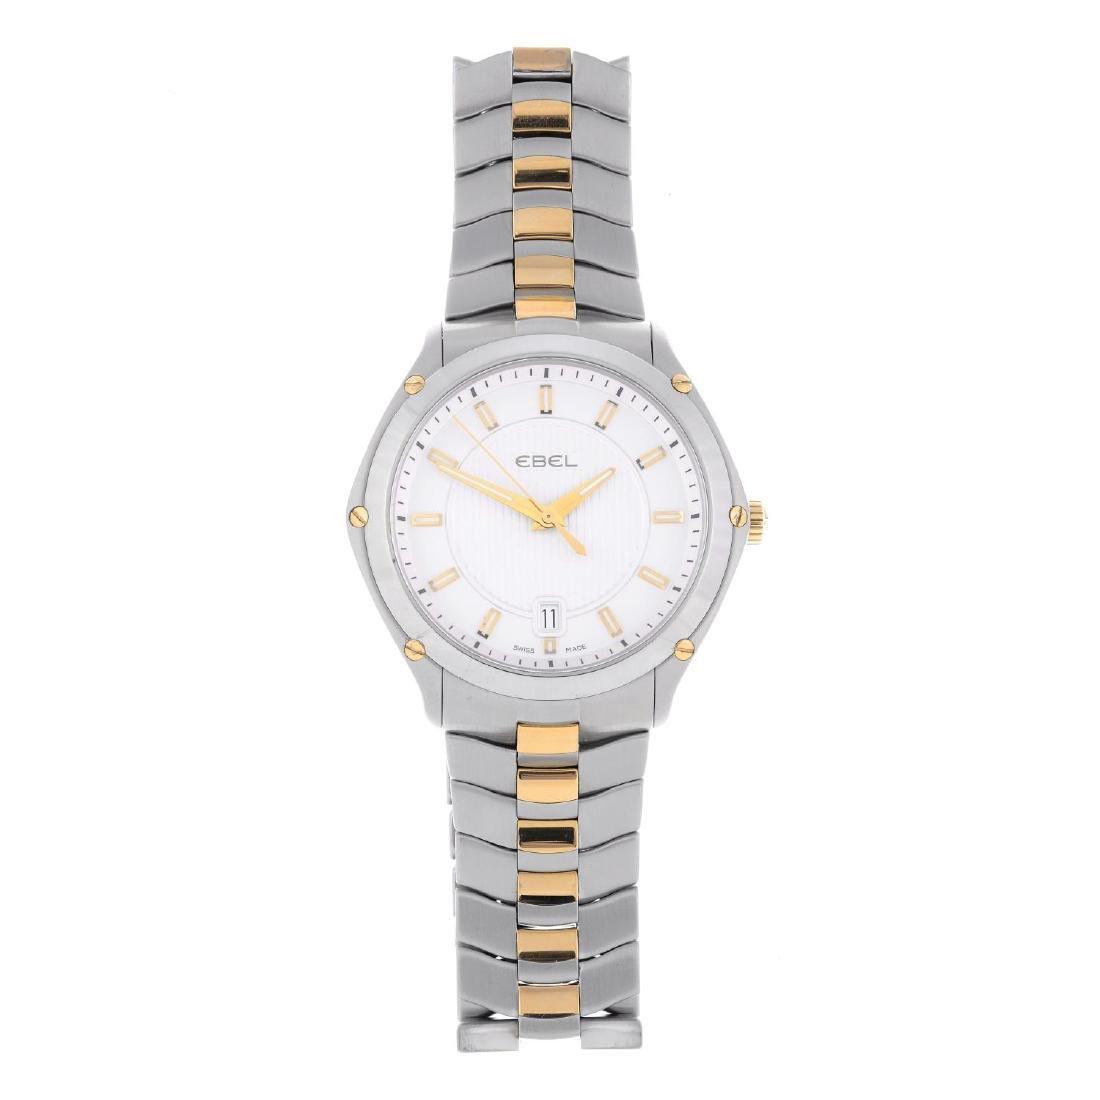 EBEL - a gentleman's Classic Sport bracelet watch.